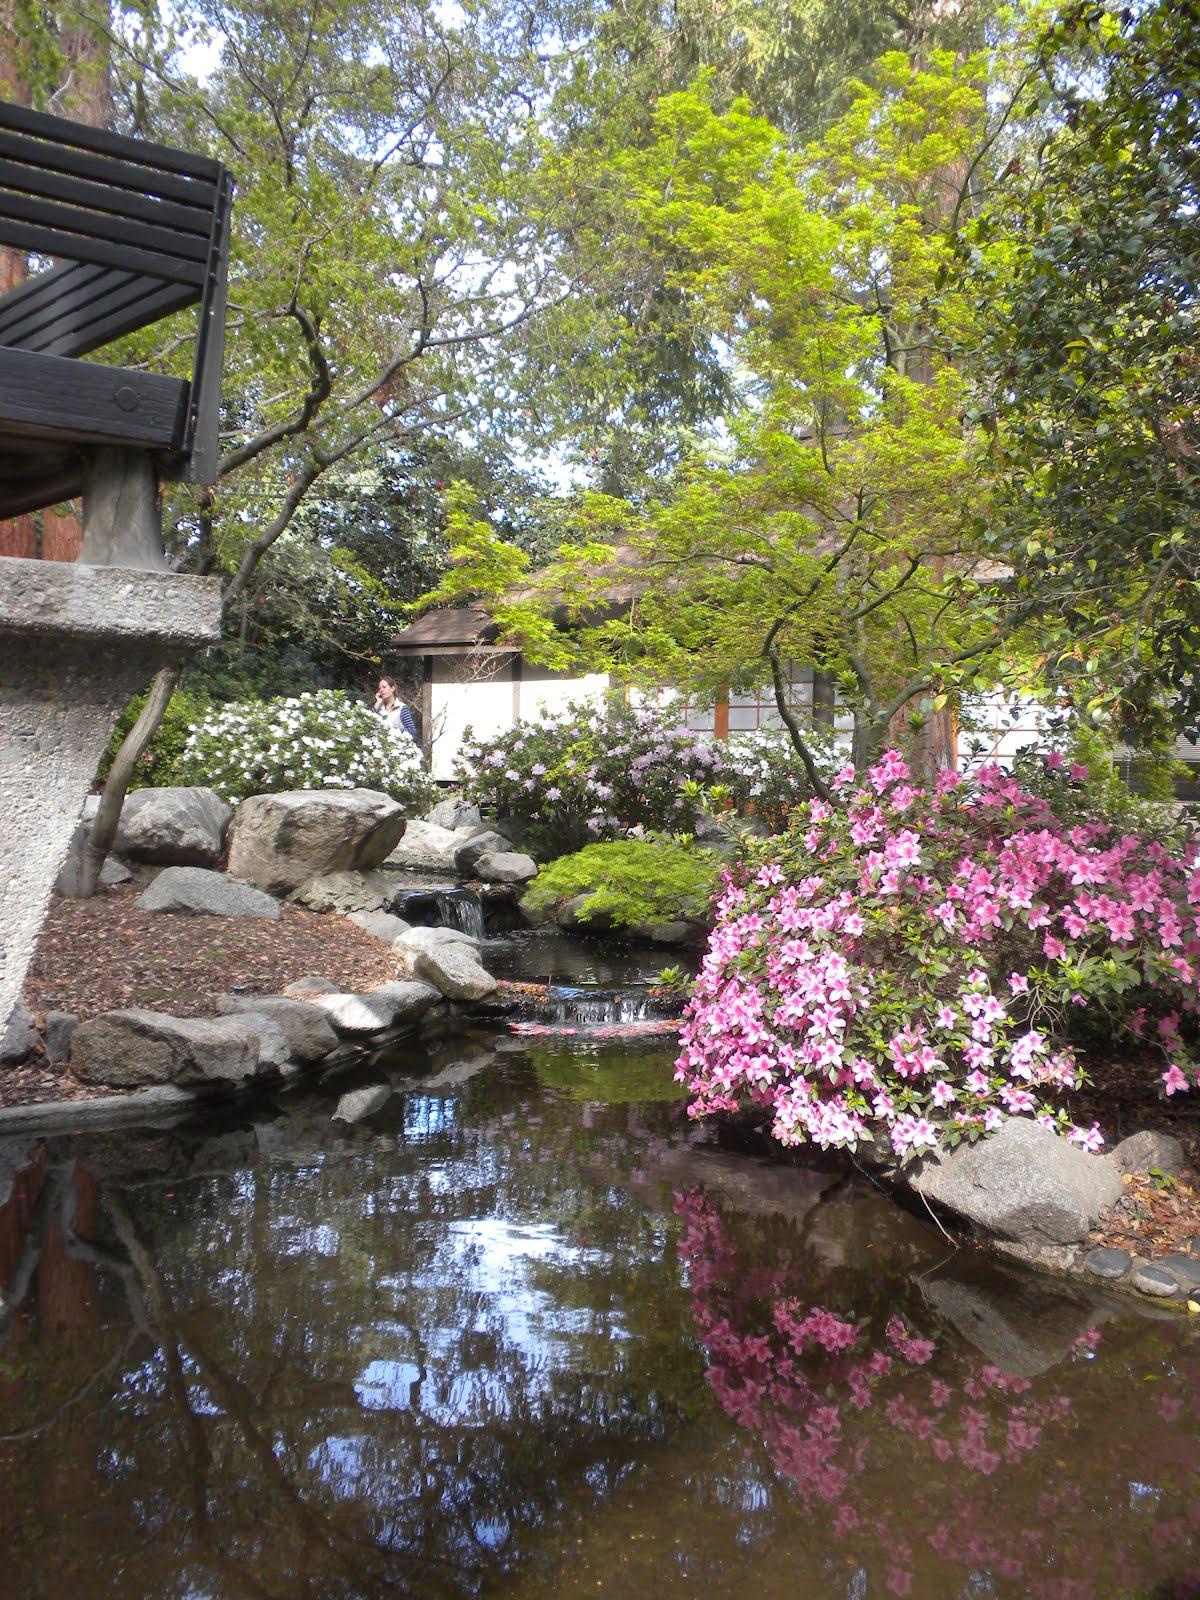 Blog rachel fujii illustration descanso gardens visit - Descanso gardens cherry blossom festival ...